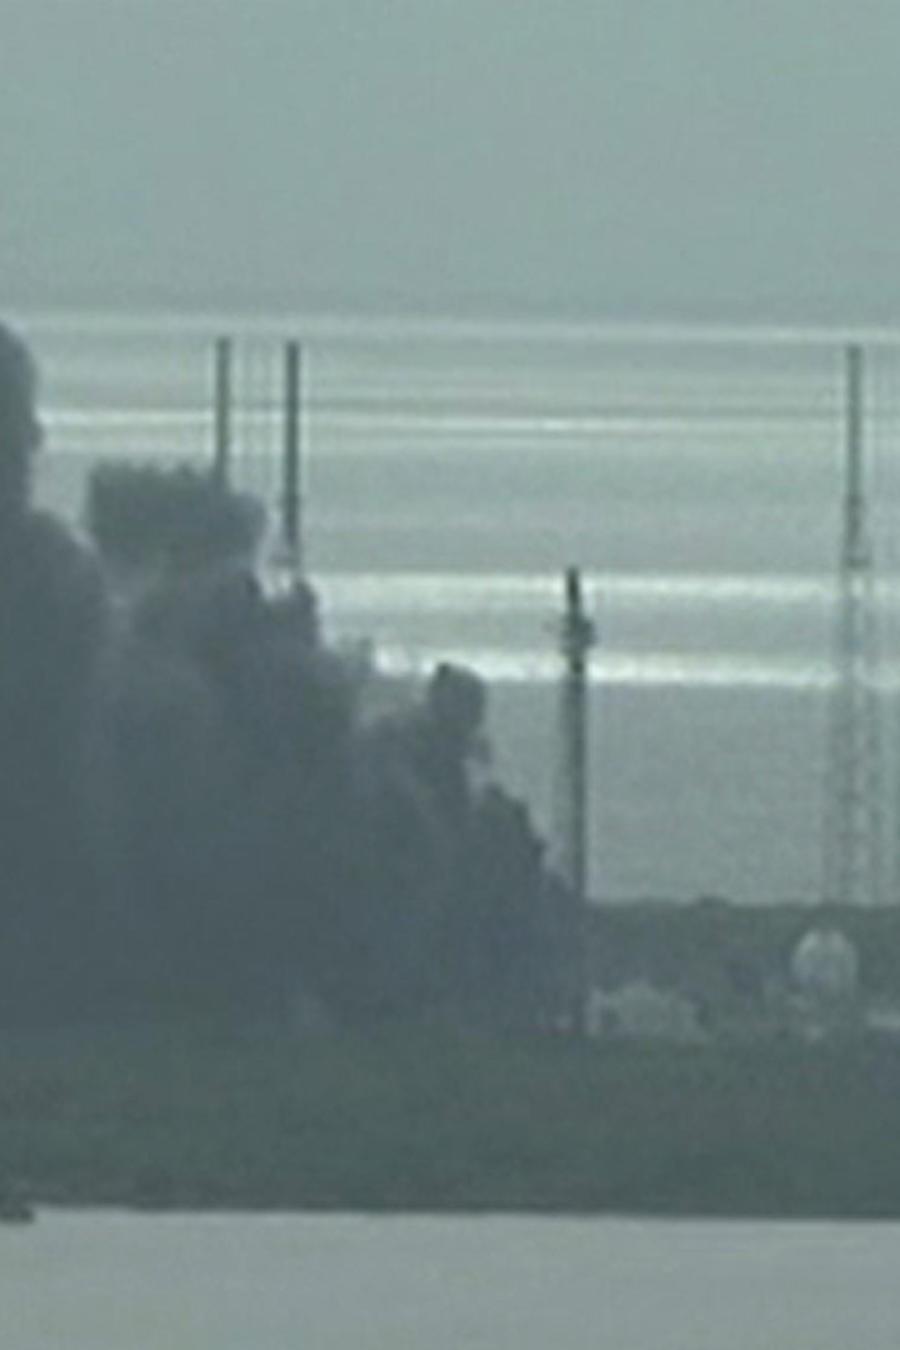 Estalla un cohete de la NASA en Cabo Cañaveral